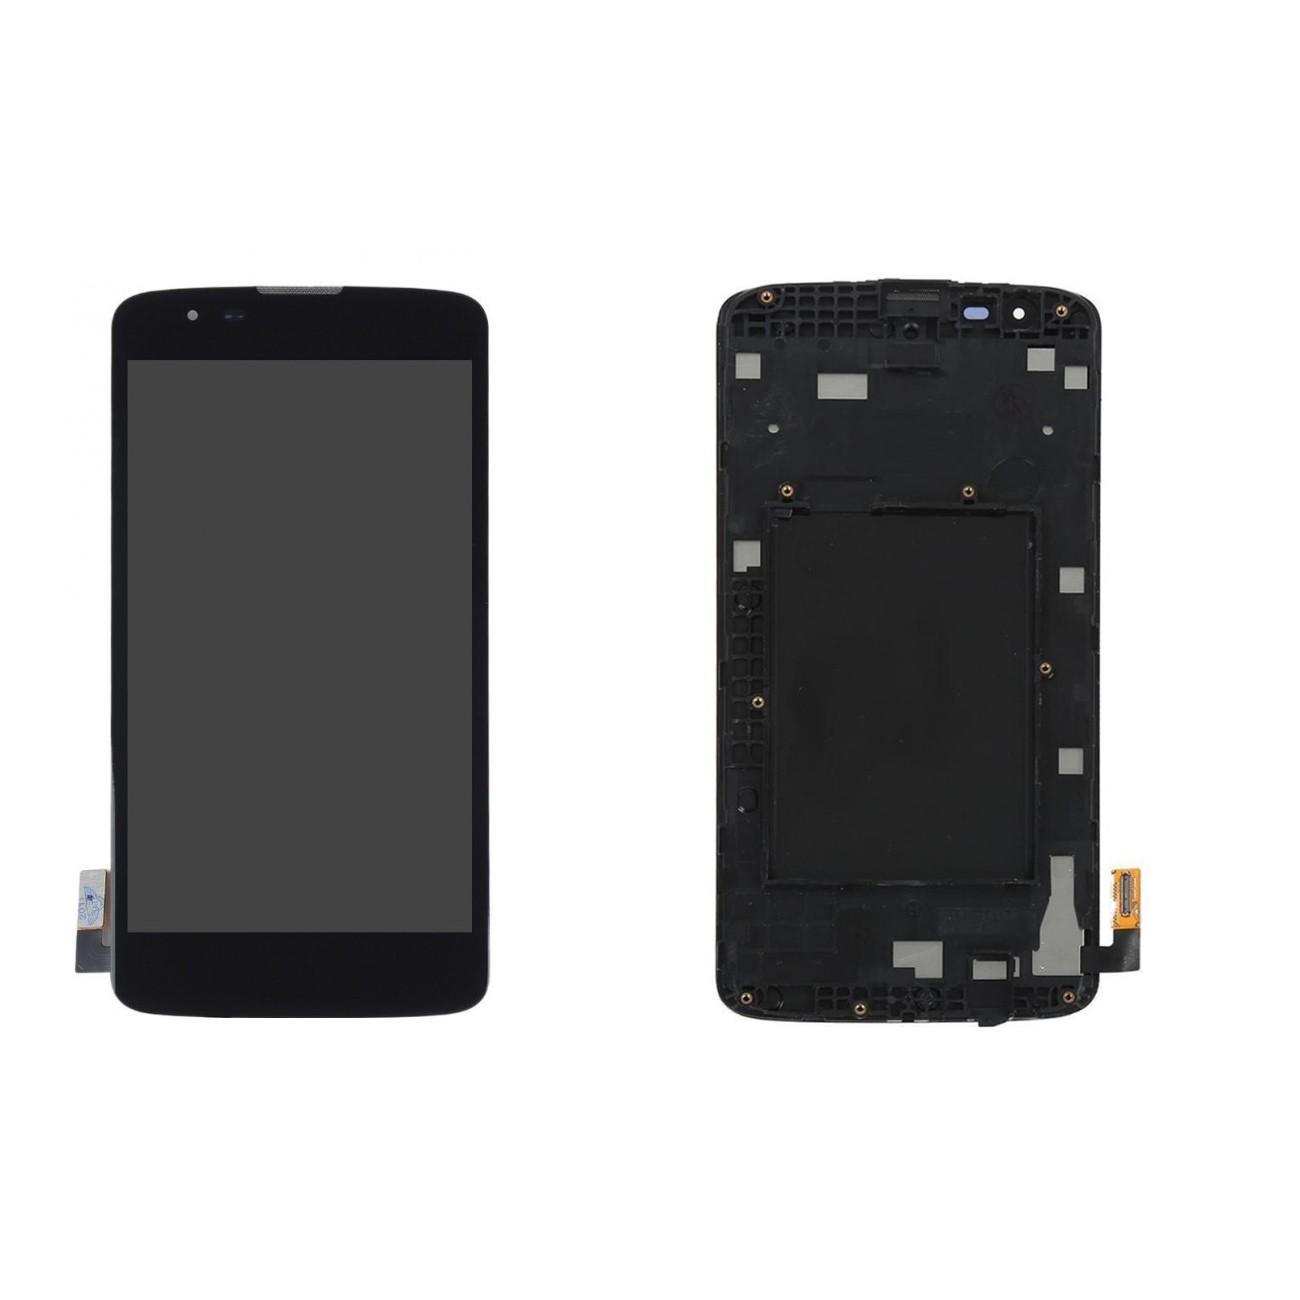 Tela Frontal LG K7 K330 c/ aro Preto